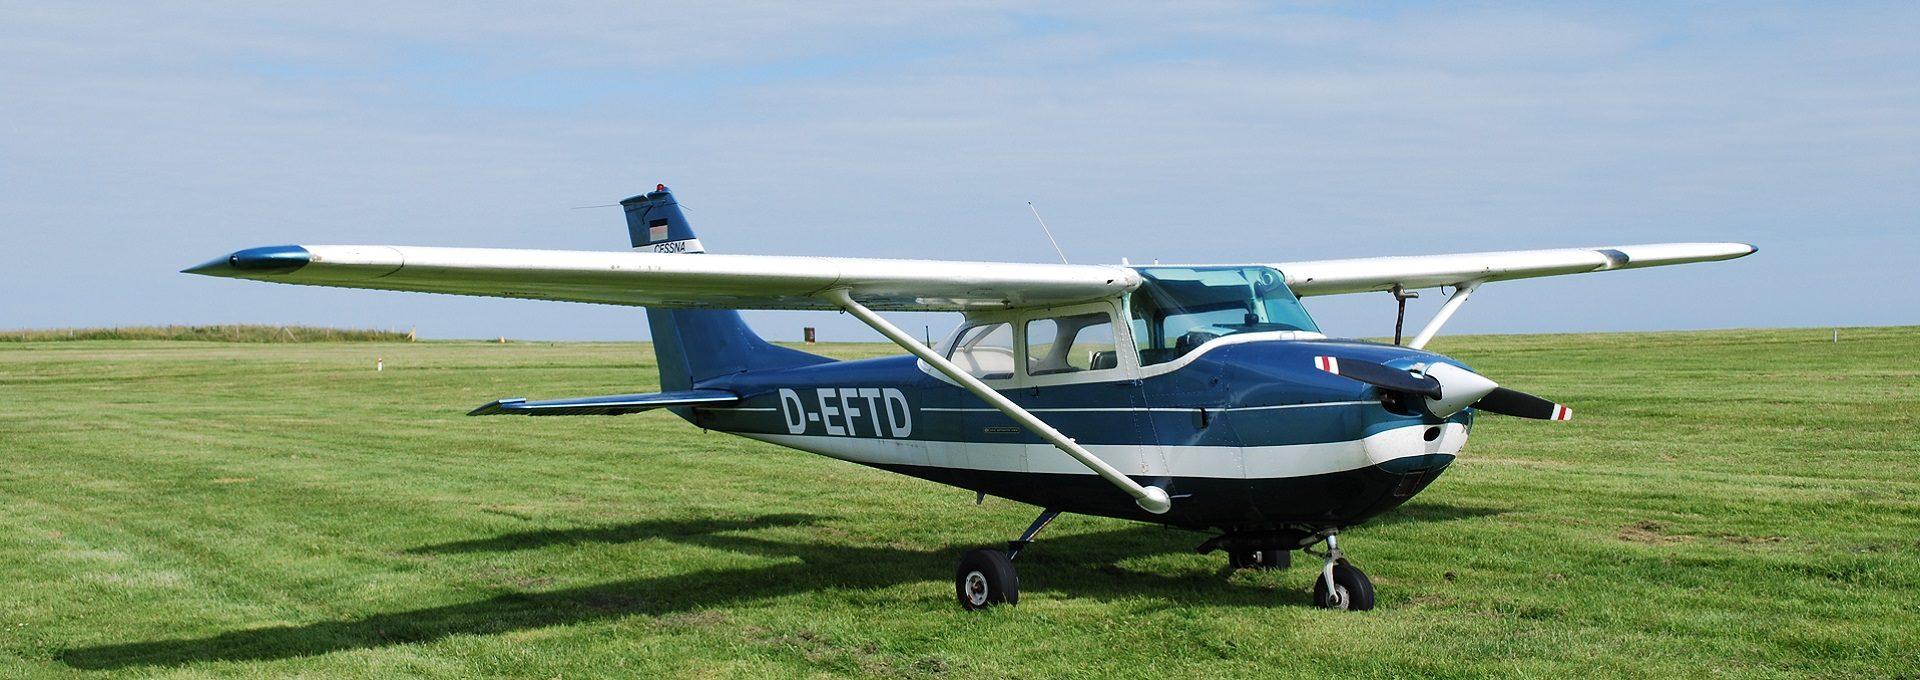 Aufnahme Flugzeug